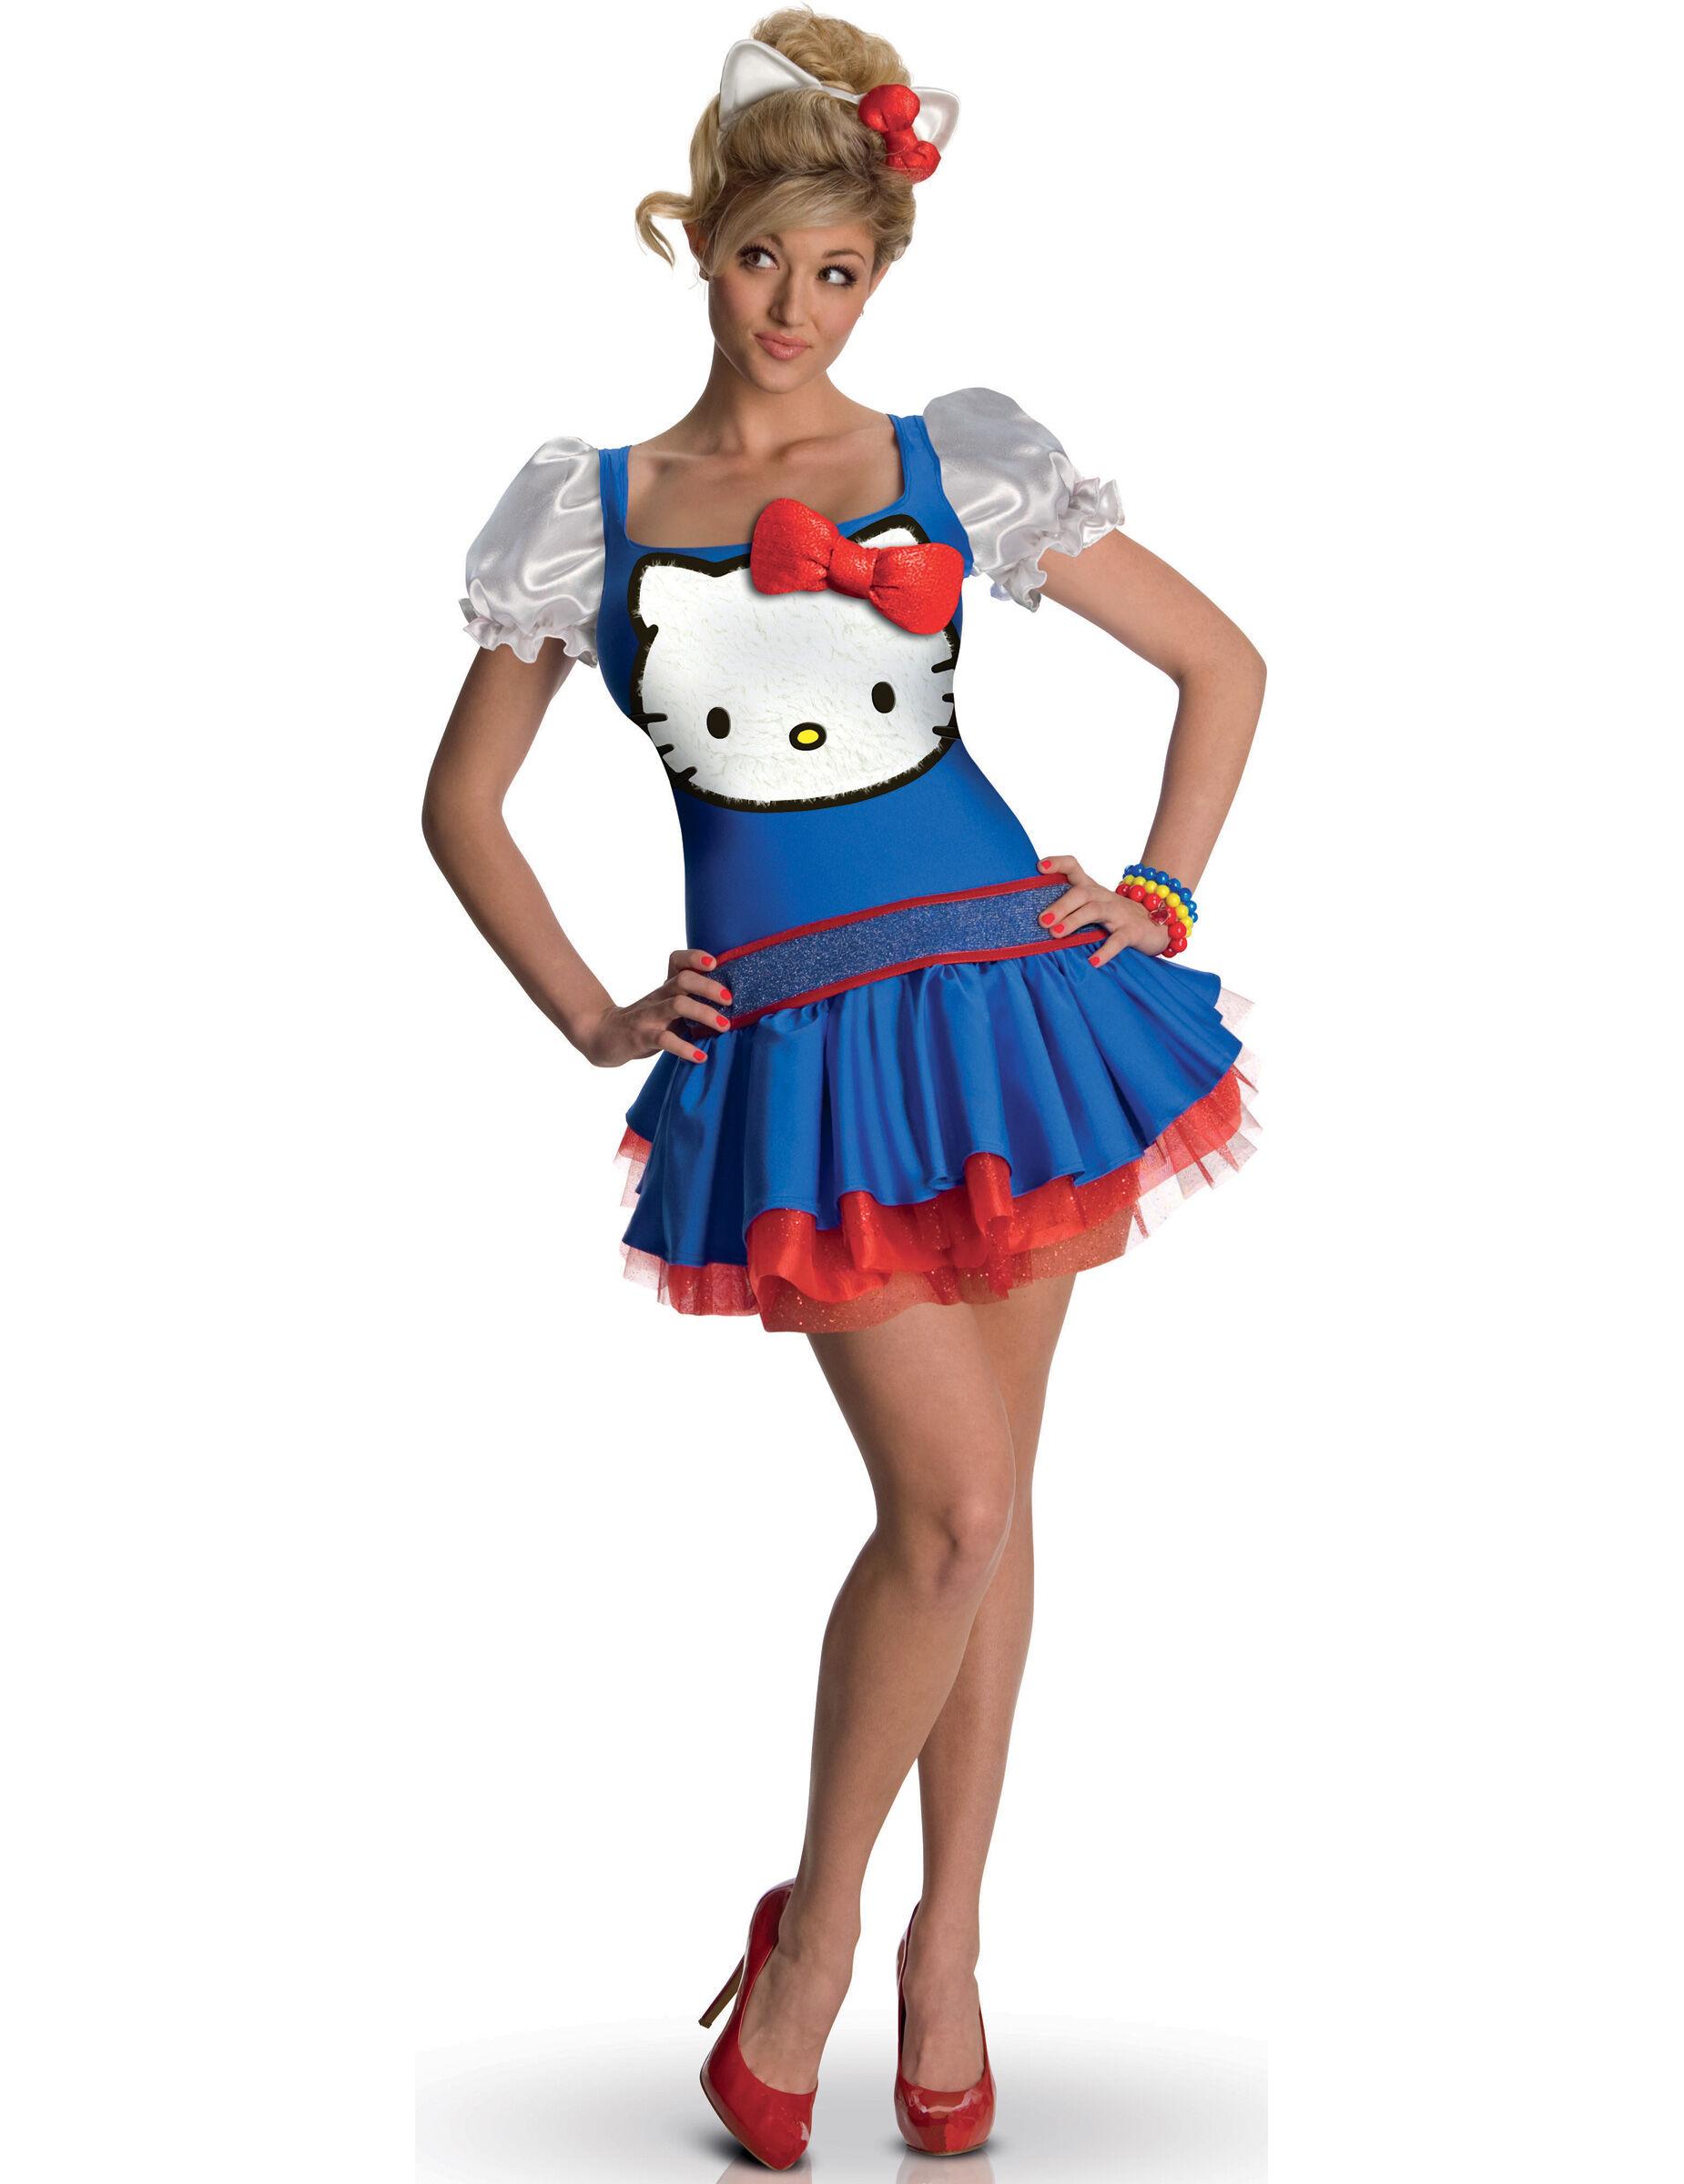 Deguisetoi Déguisement Hello Kitty bleu adulte - Taille: XS